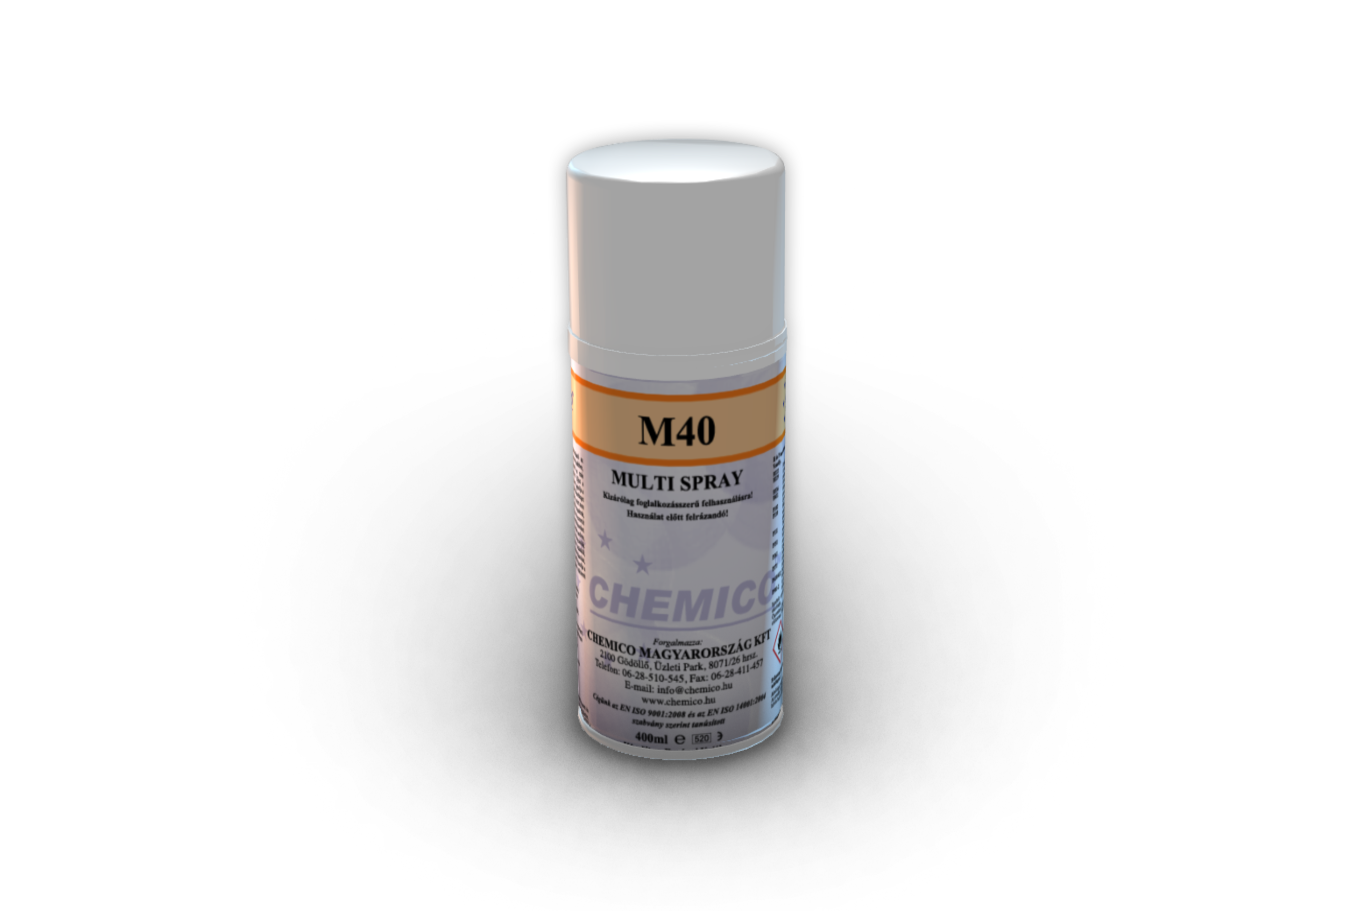 m-40-multi-spray-aerosol-korroziovedo-keno-tisztito-nedvesseg-kiszorito-ipari-chemico